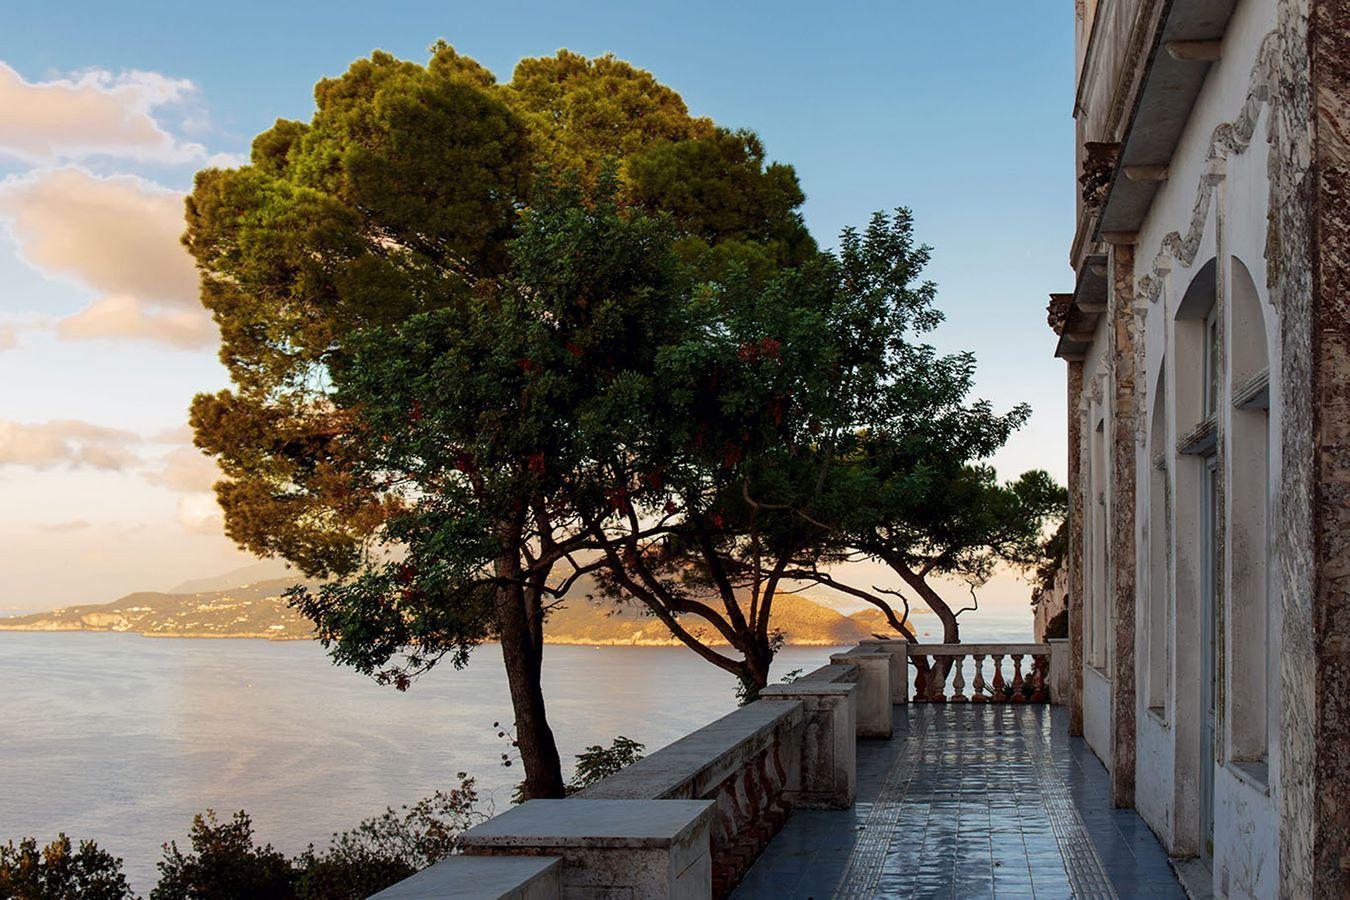 Villa Lysis, Capri Island - sheet 2